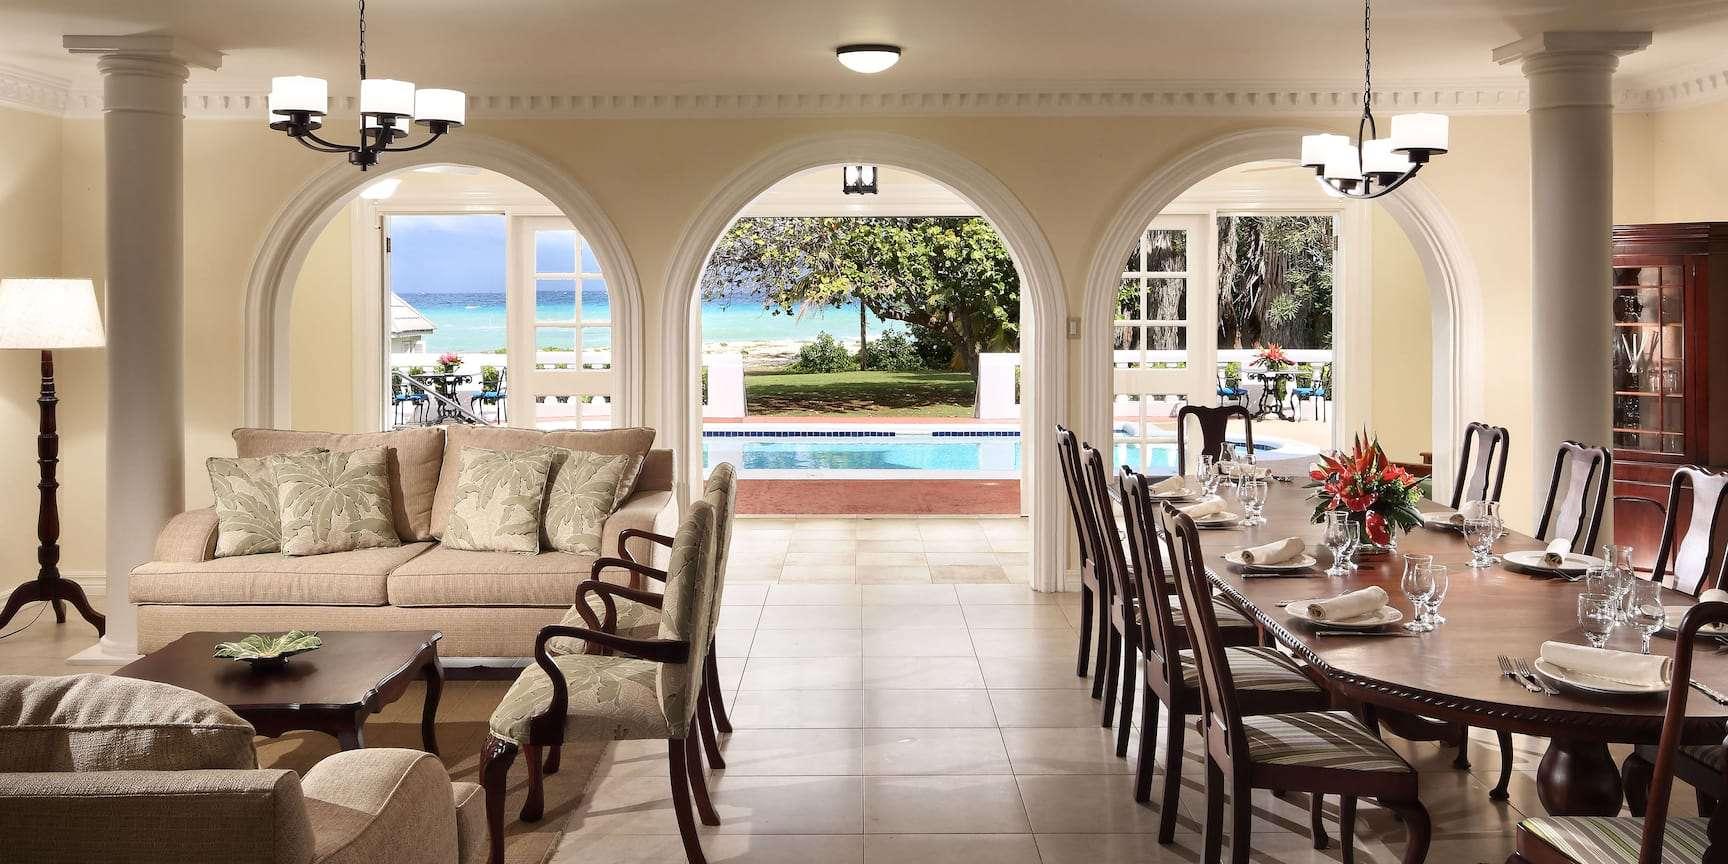 Luxury villa rentals caribbean - Jamaica - Montego bay - Half moon resort - 6 BDM Oceanfront Villa - Image 1/11